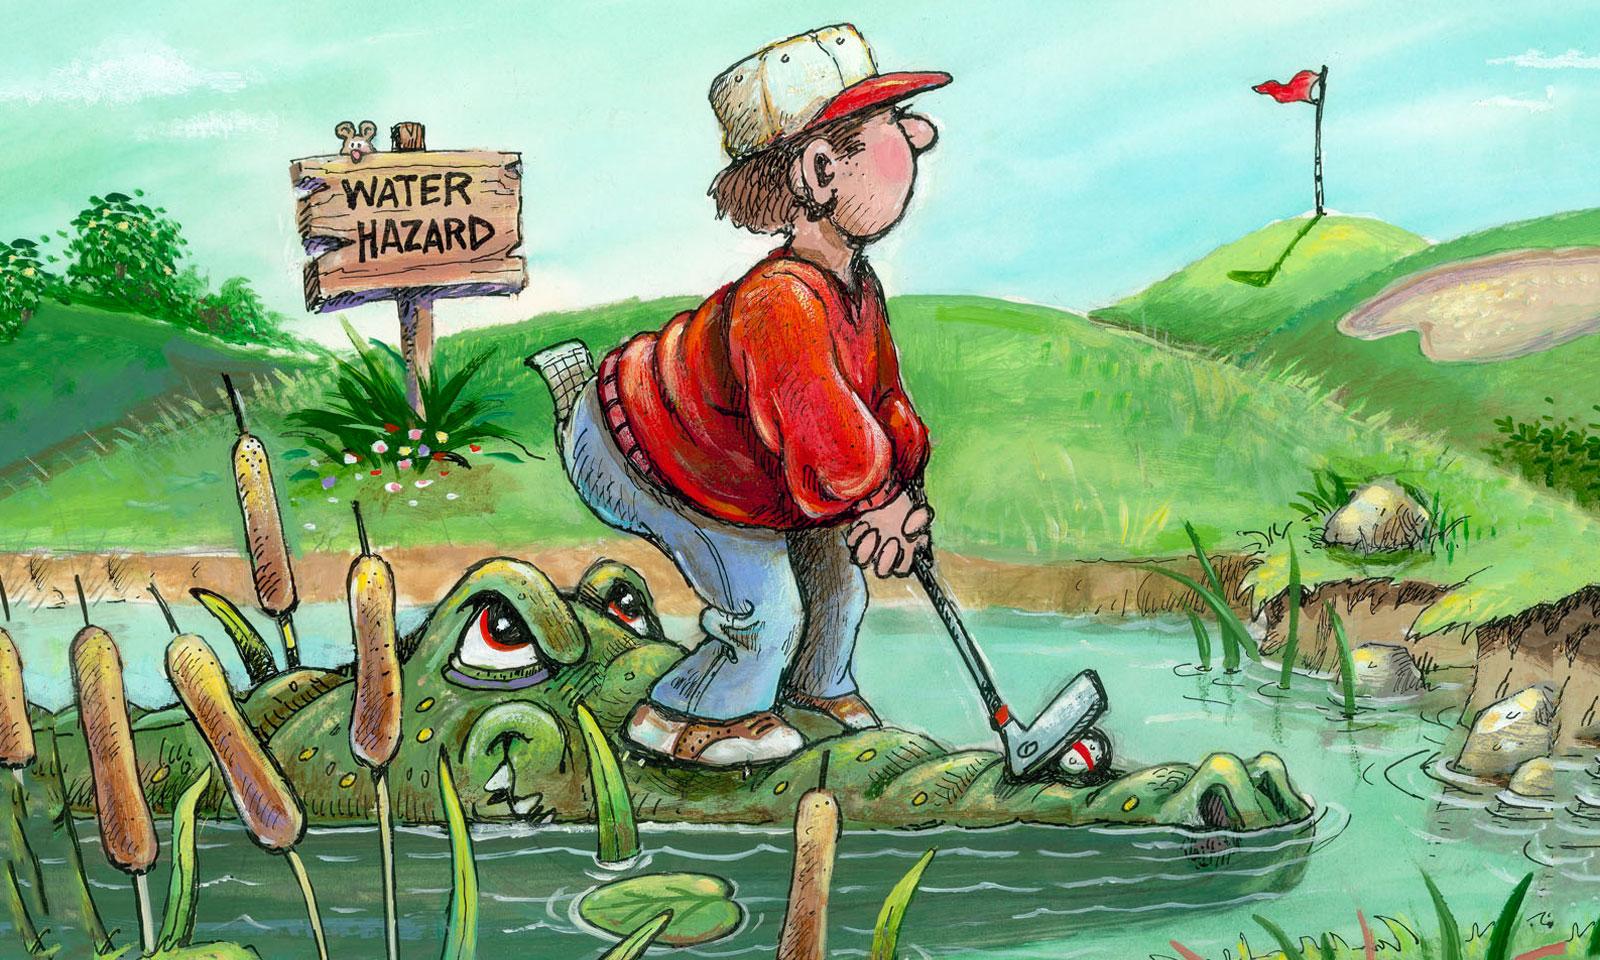 Artist Gary Patterson Captures the Humor of Golf Water Hazard